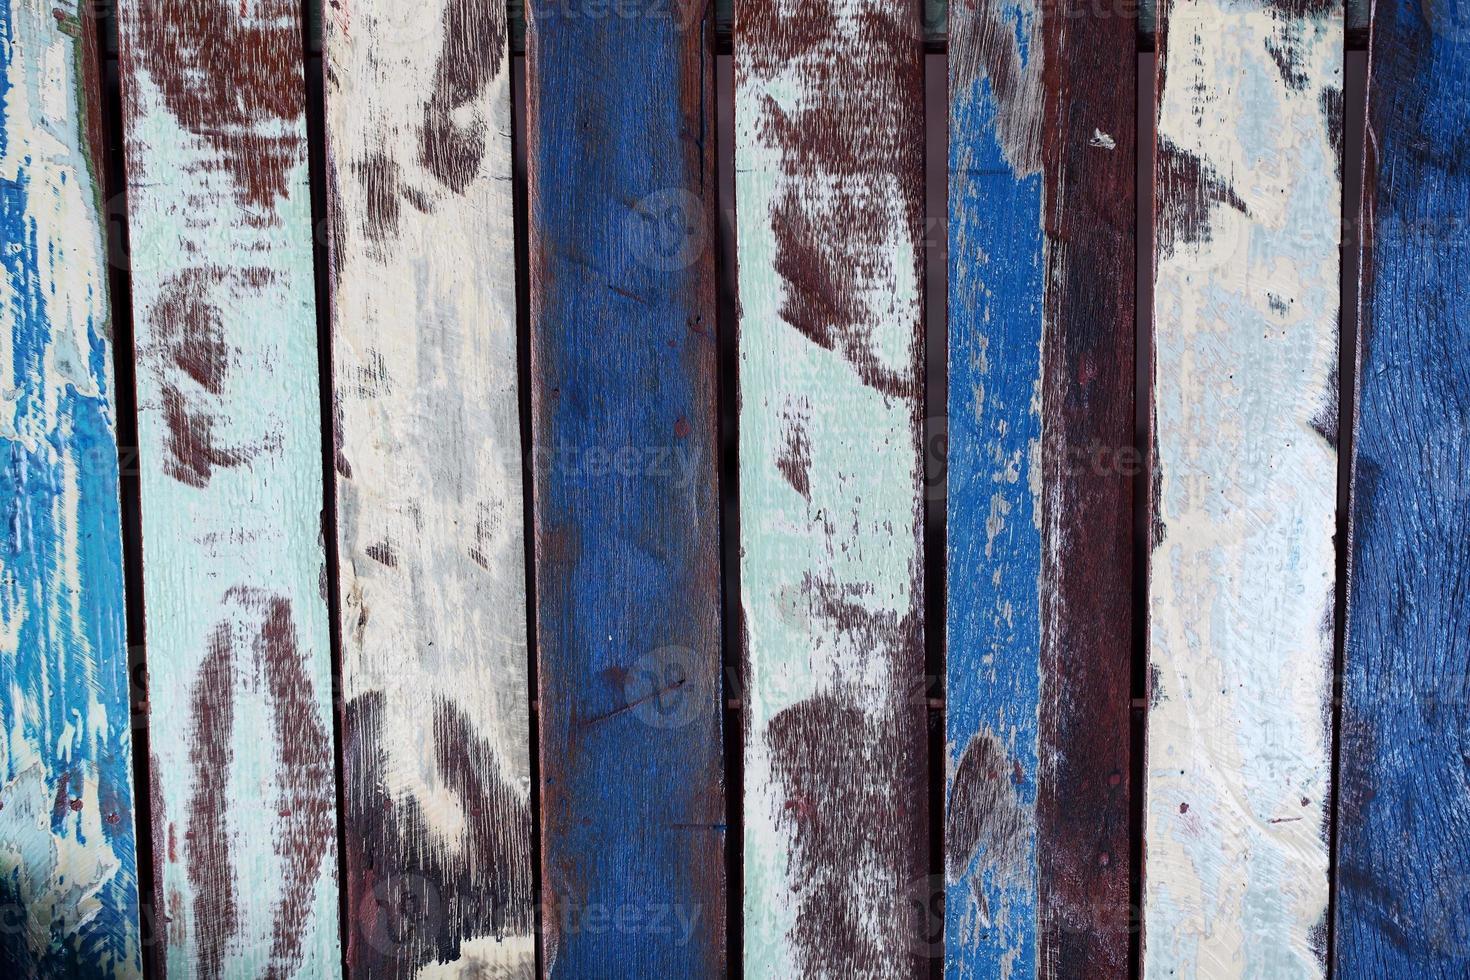 pannelli in legno grunge foto